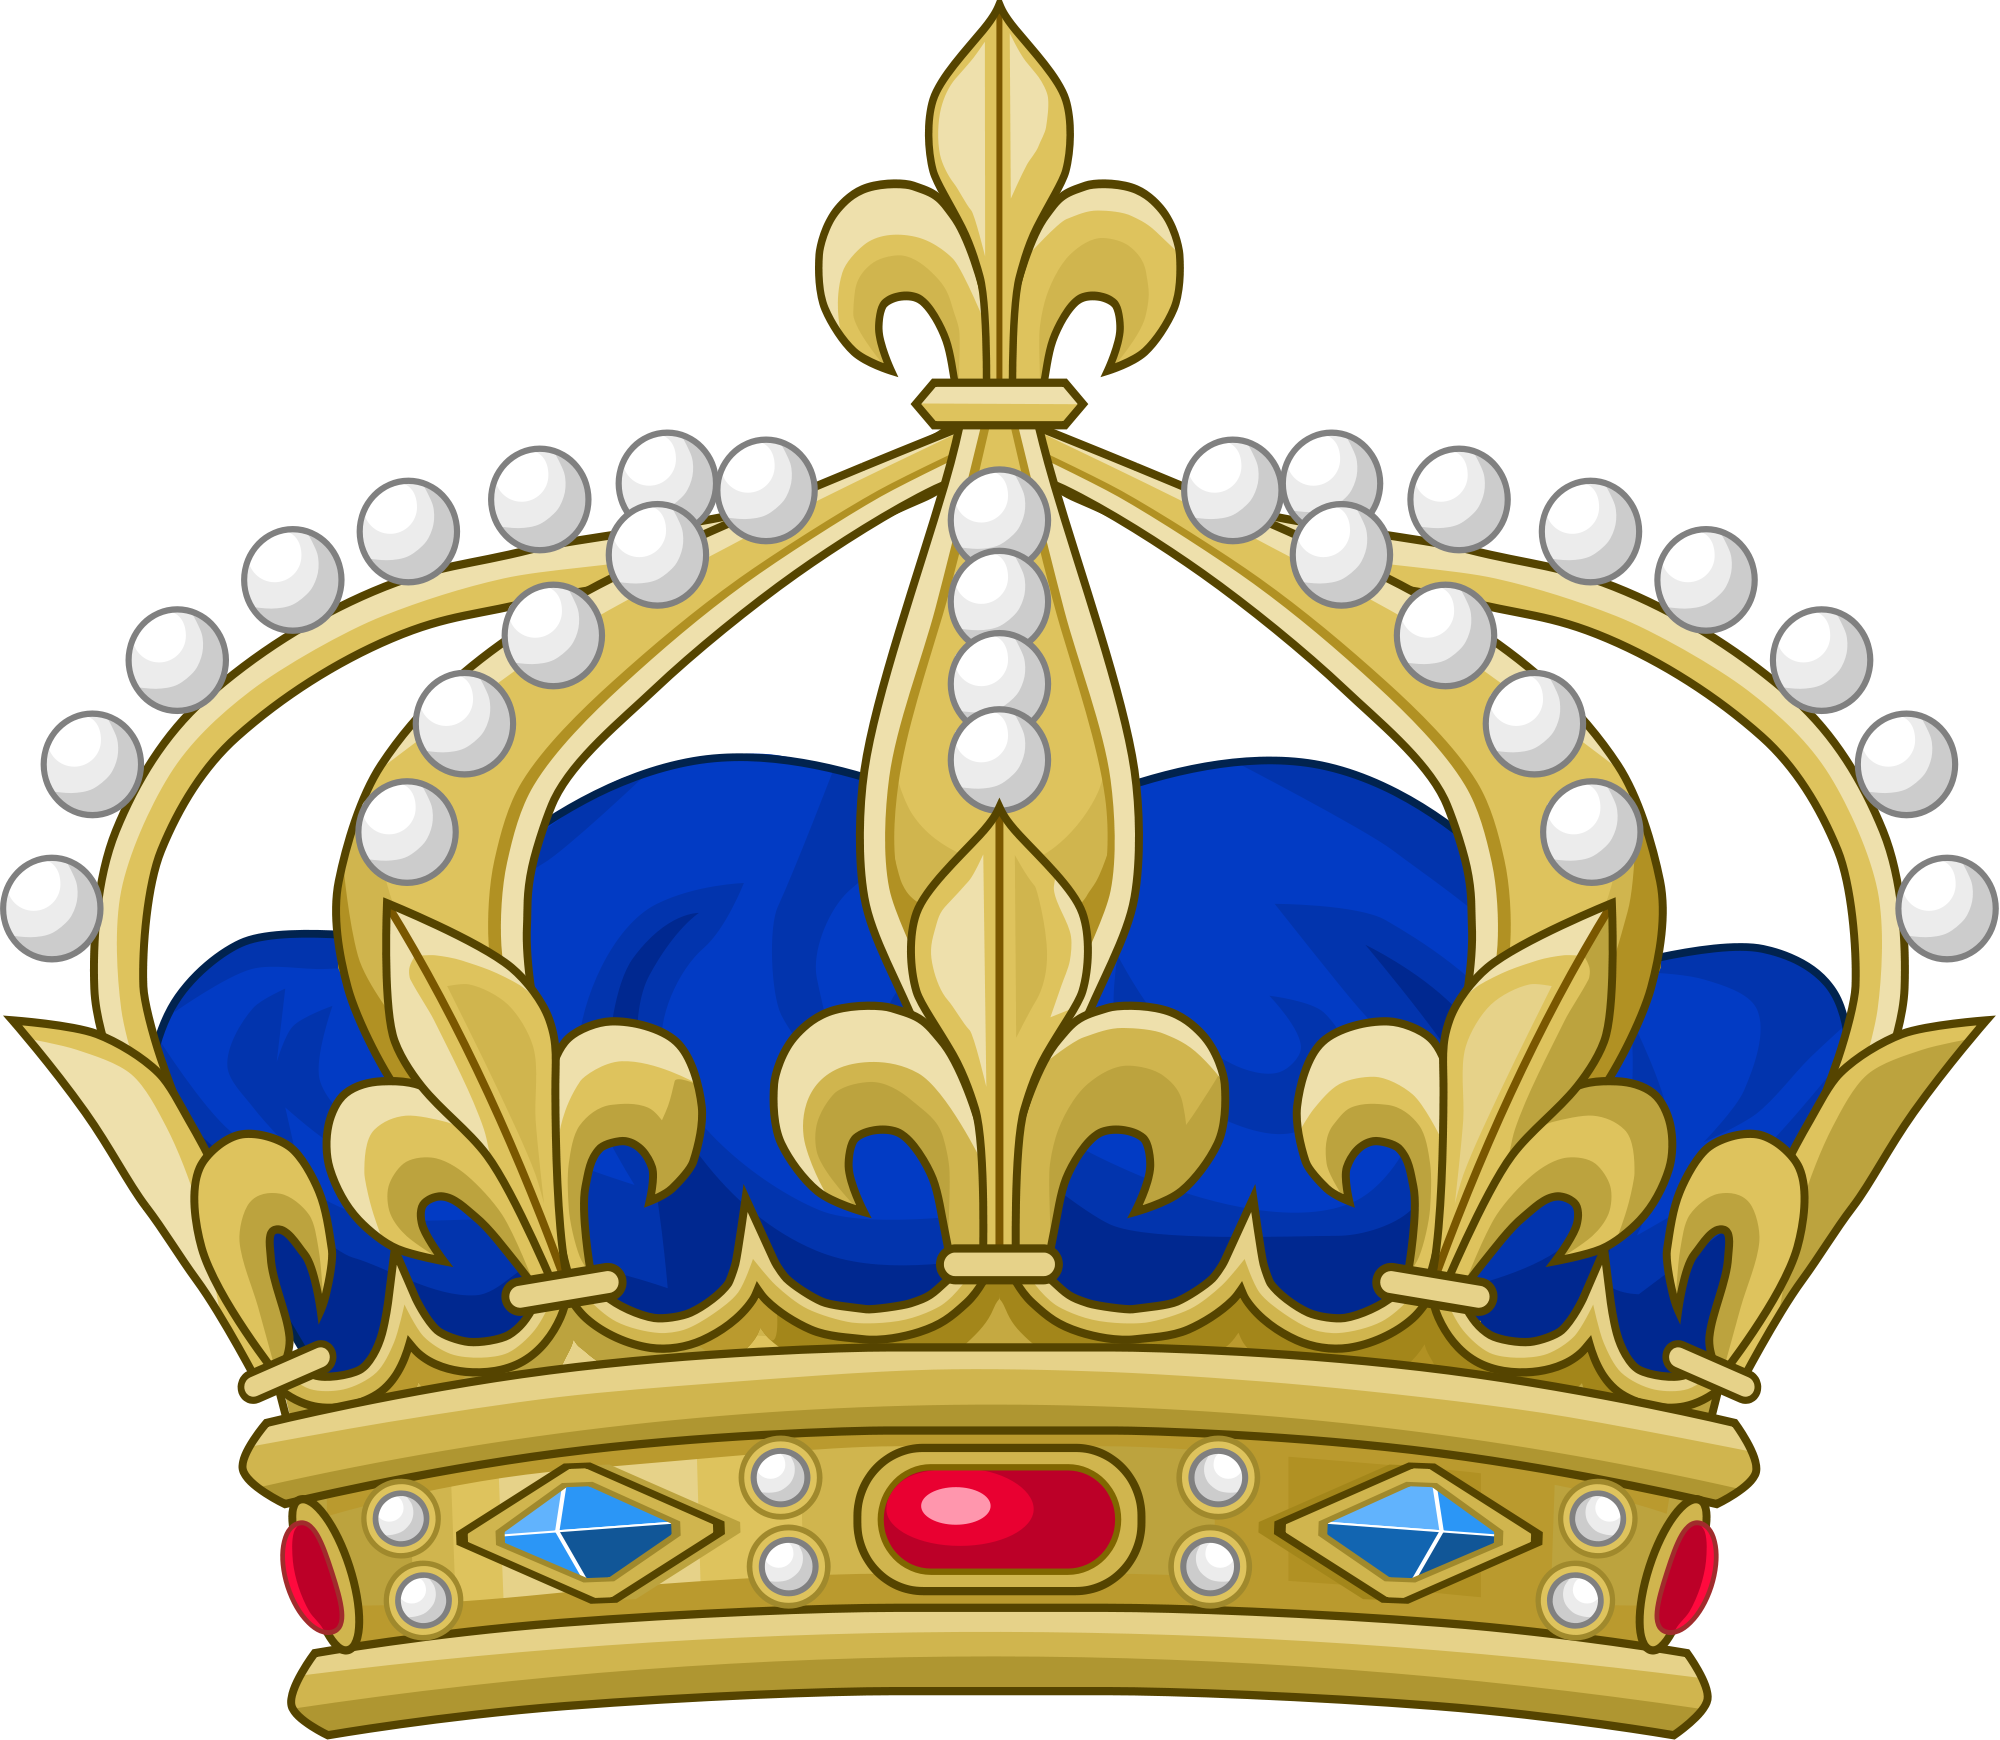 2000px Royal Crown Of France Svg Png 2000 1740 Diseno De Tatuaje De Corona Ilustracion De Corona Crown Royal